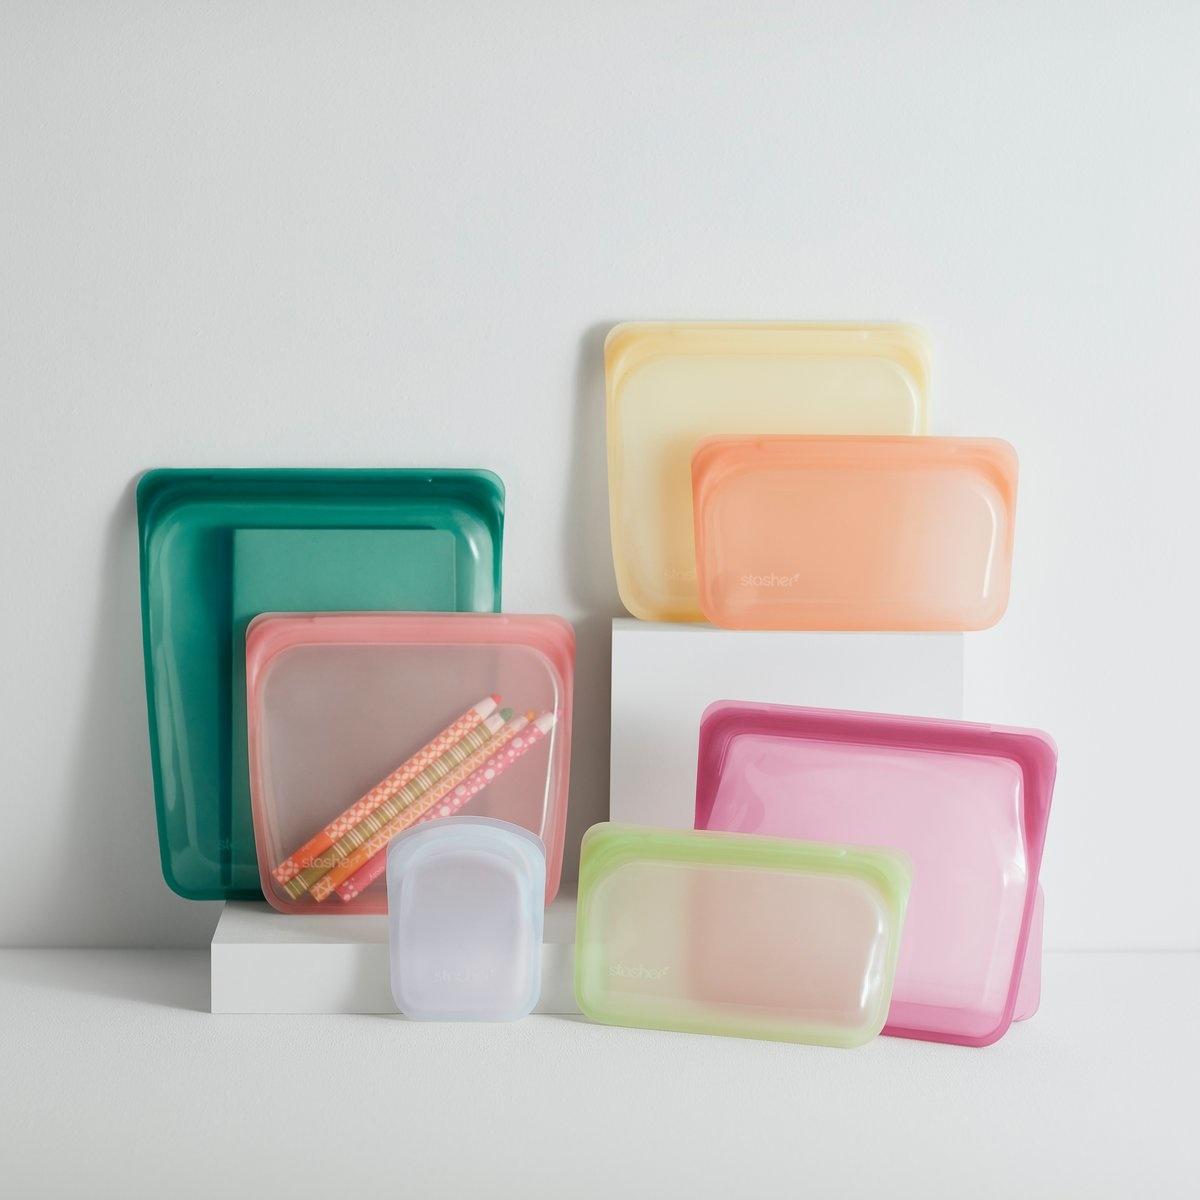 STASHER - Comment garder vos sacs propres et sentir bon*